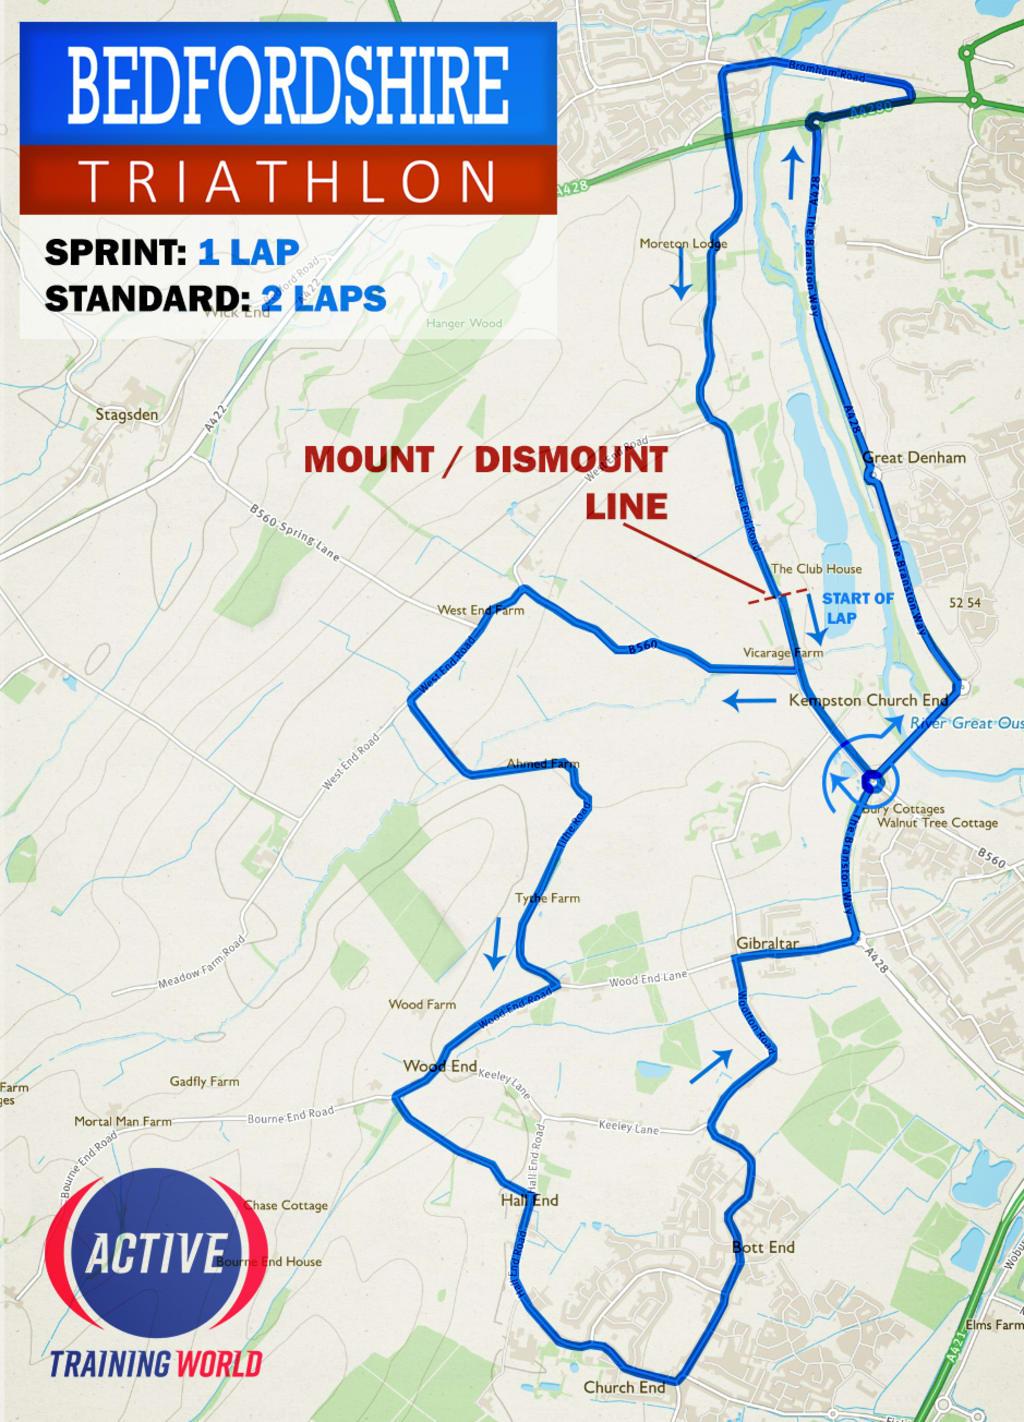 Bedfordshire_Triathlon_Bike_Map.jpg